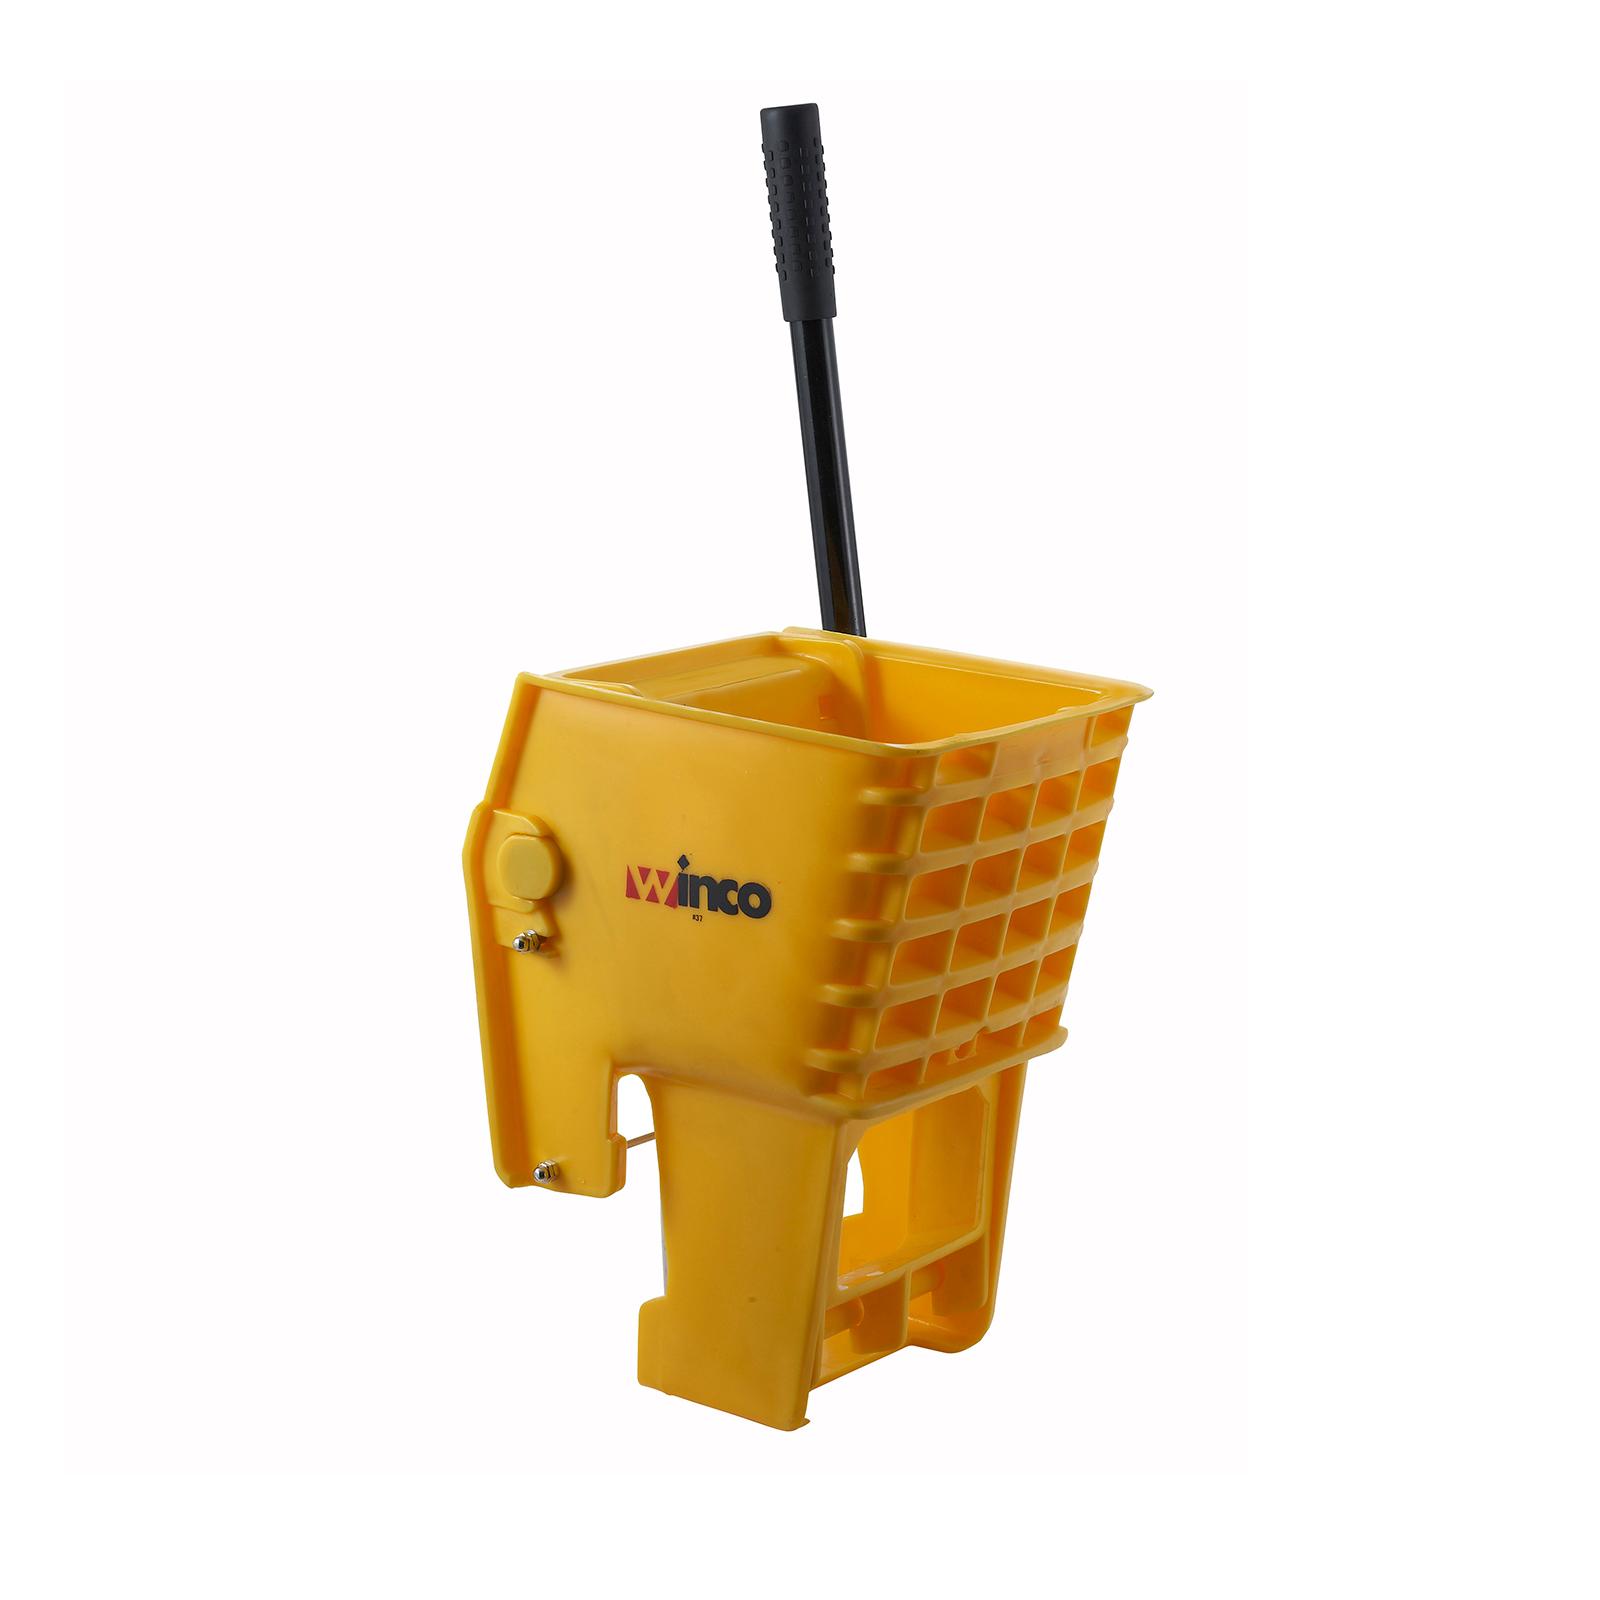 Winco MPB-36W mop wringer